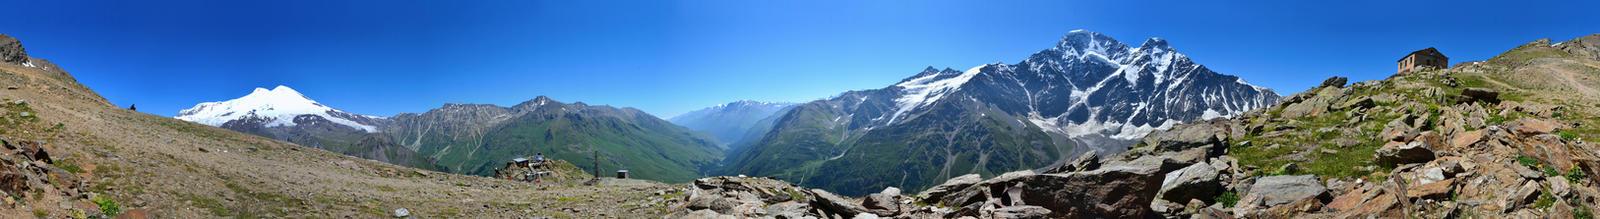 Mountains round panorama by Don-ko